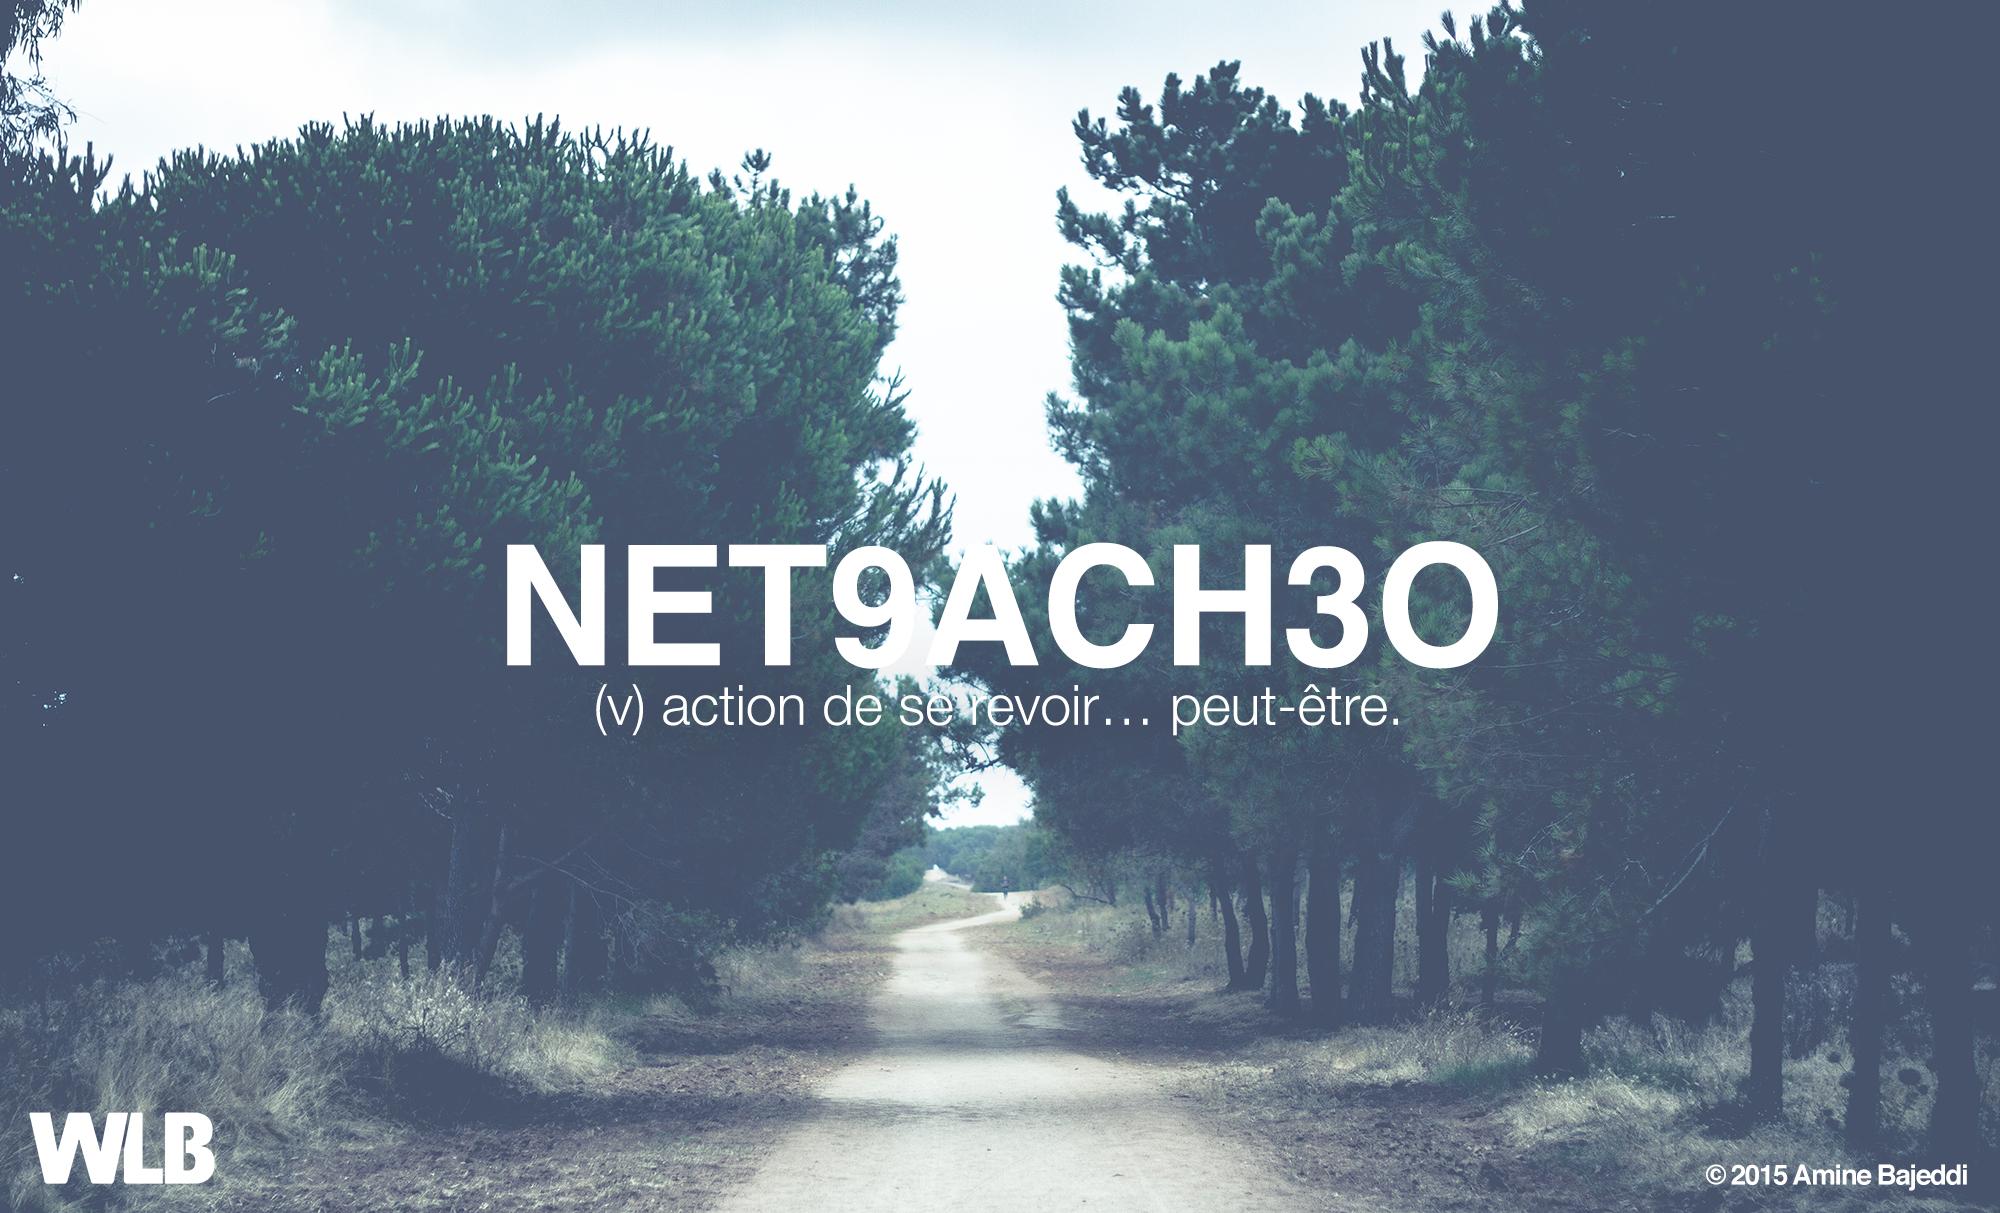 net9ach3o